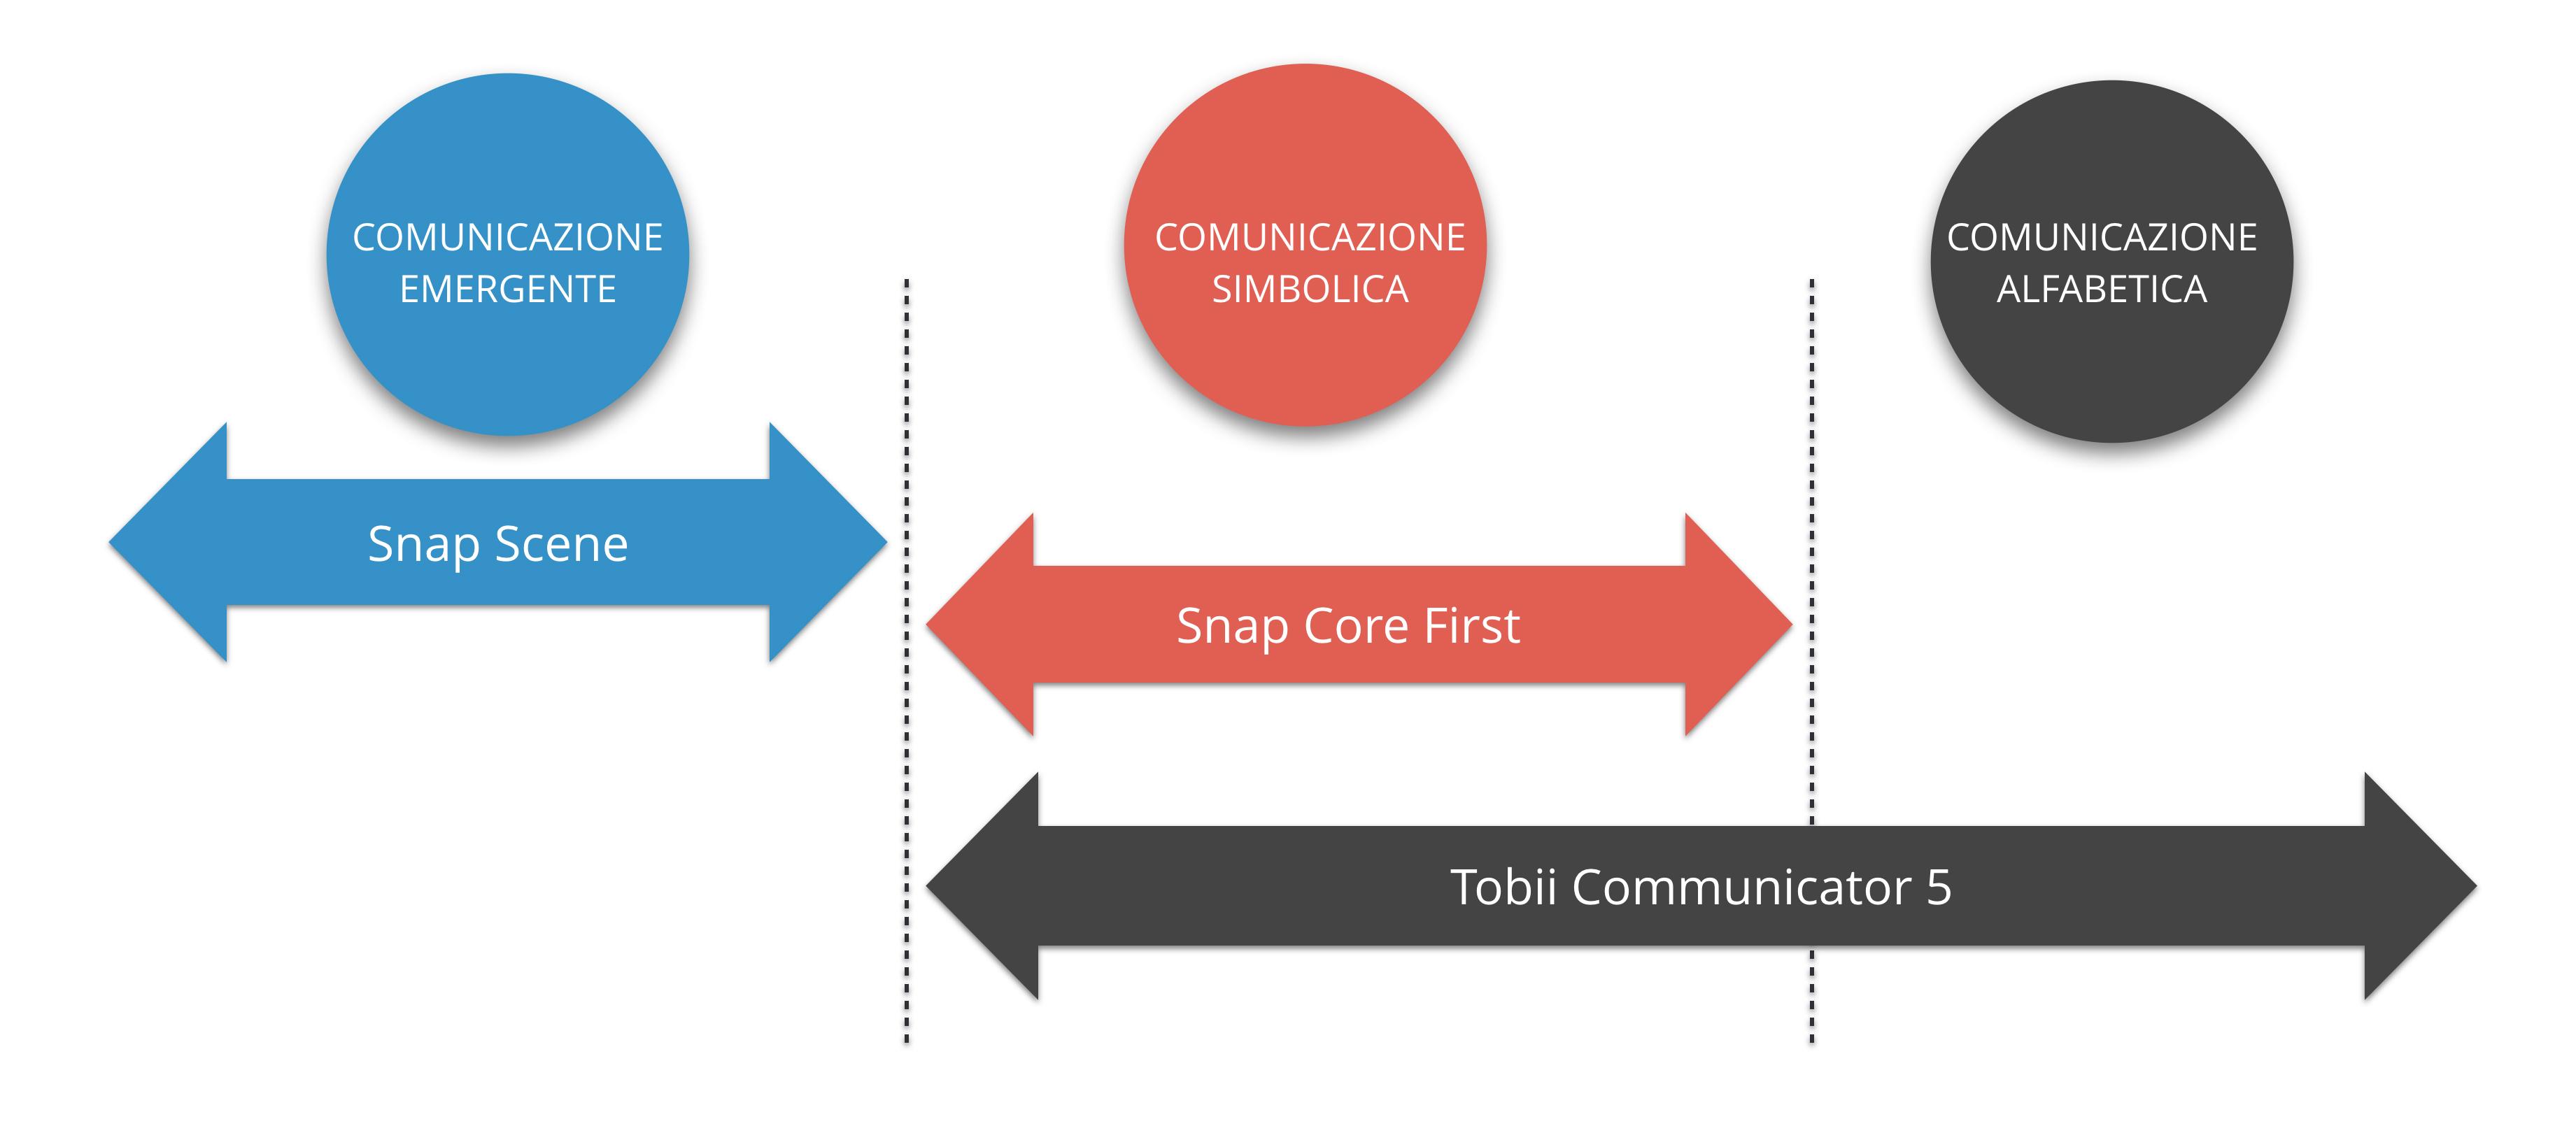 Software utilizzati per i vari tipi di comunicazione